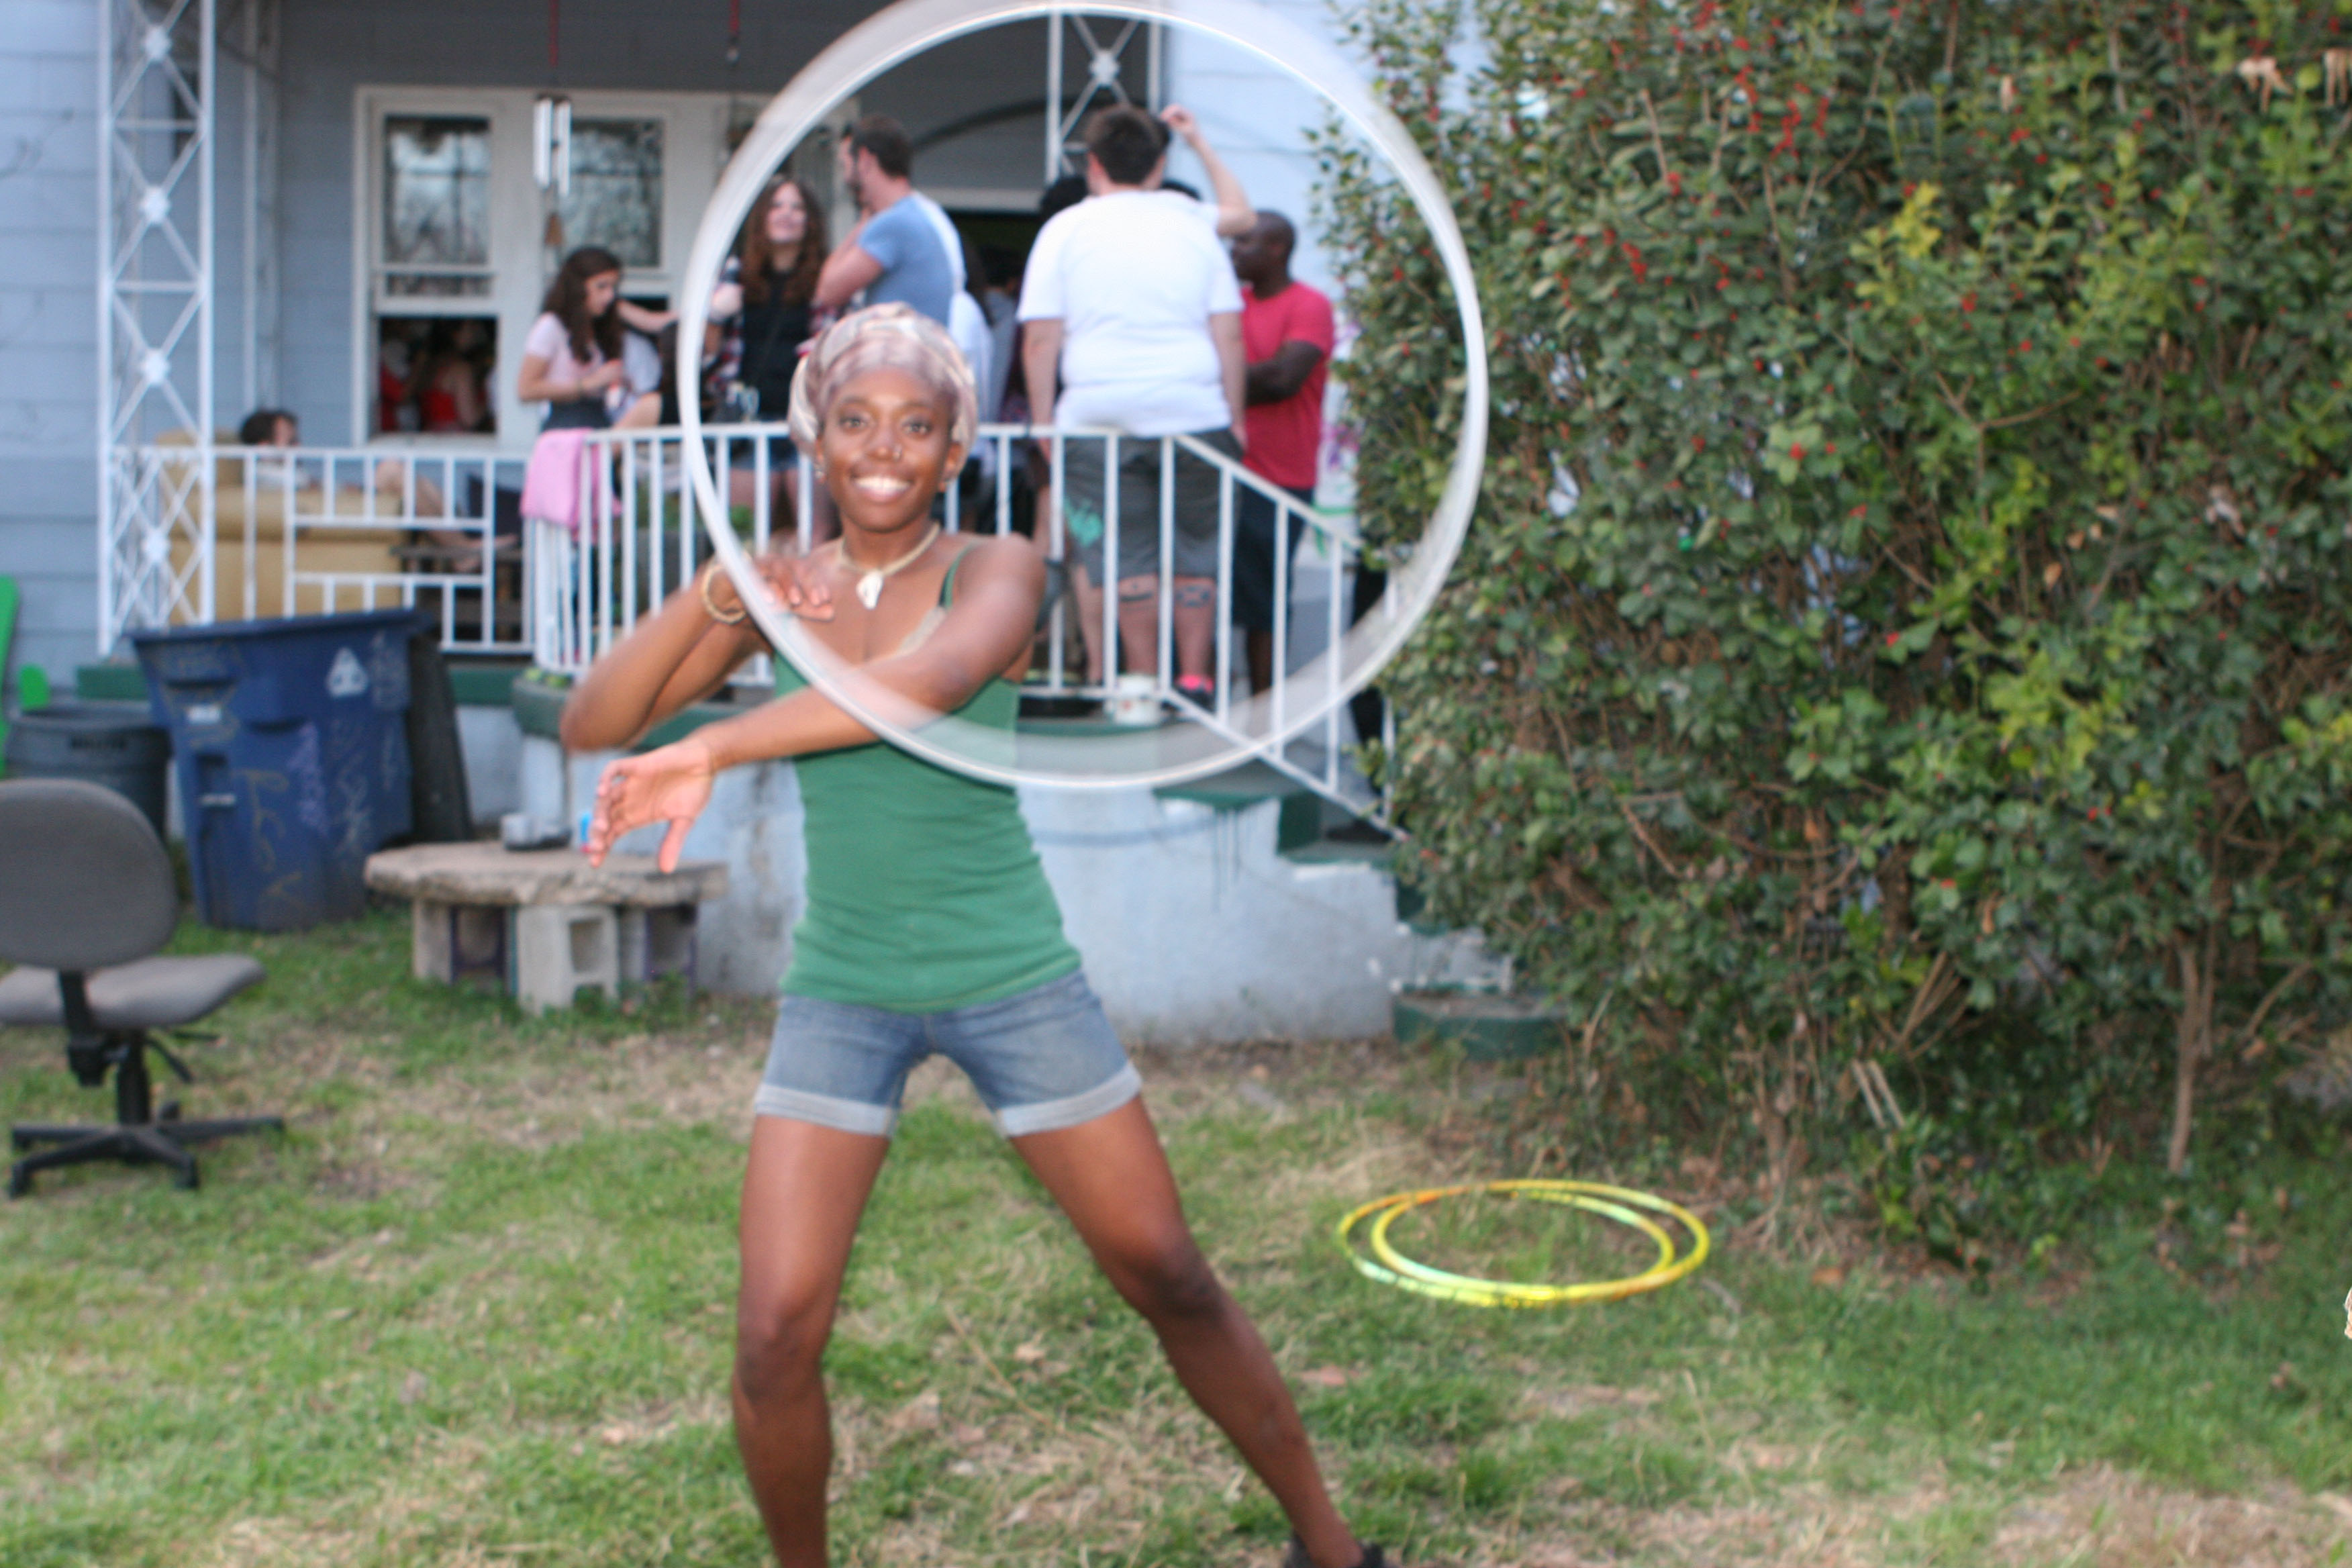 street performer, Nnendi